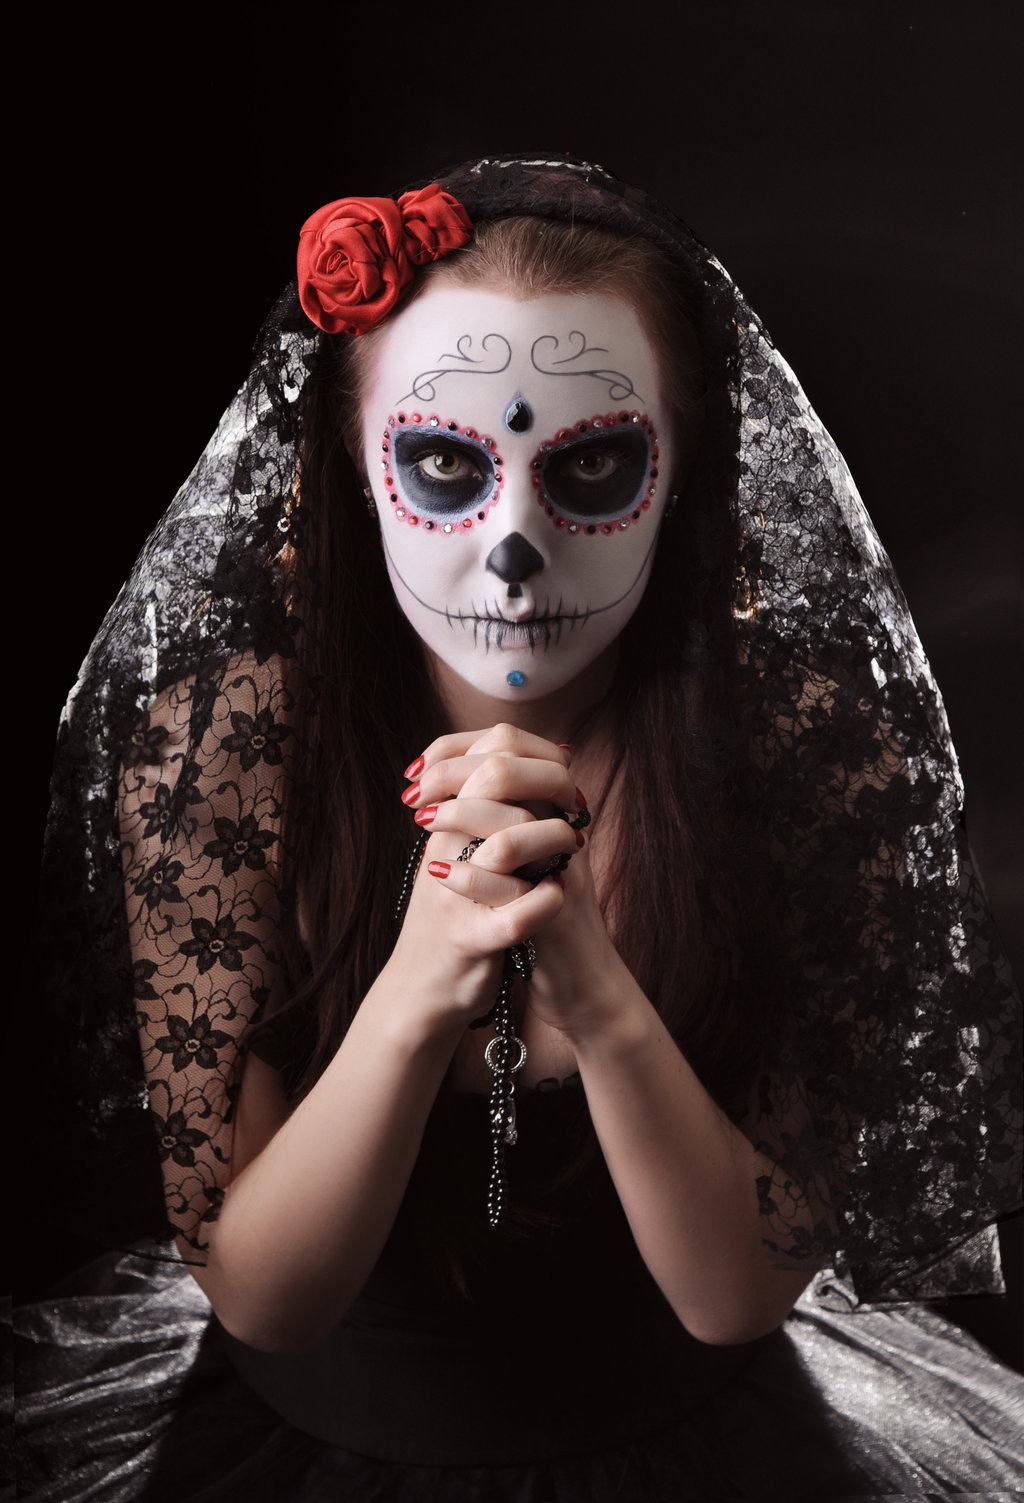 dia_de_los_muertos_3_by_b_e_t_t_y_b-d33lcbq